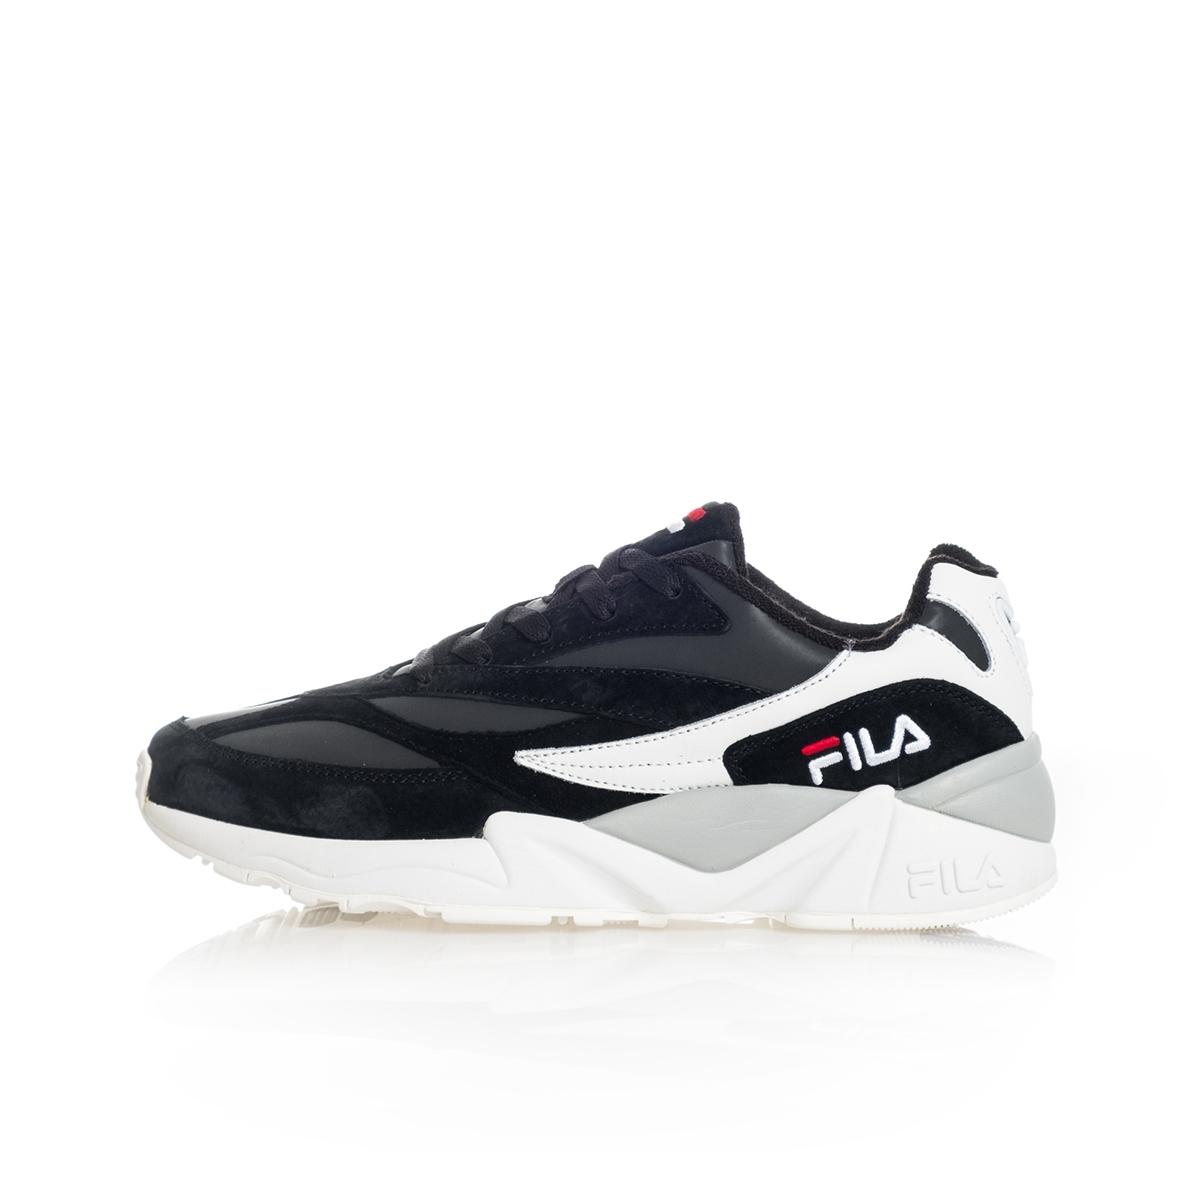 Fila Sneaker: 176 listings